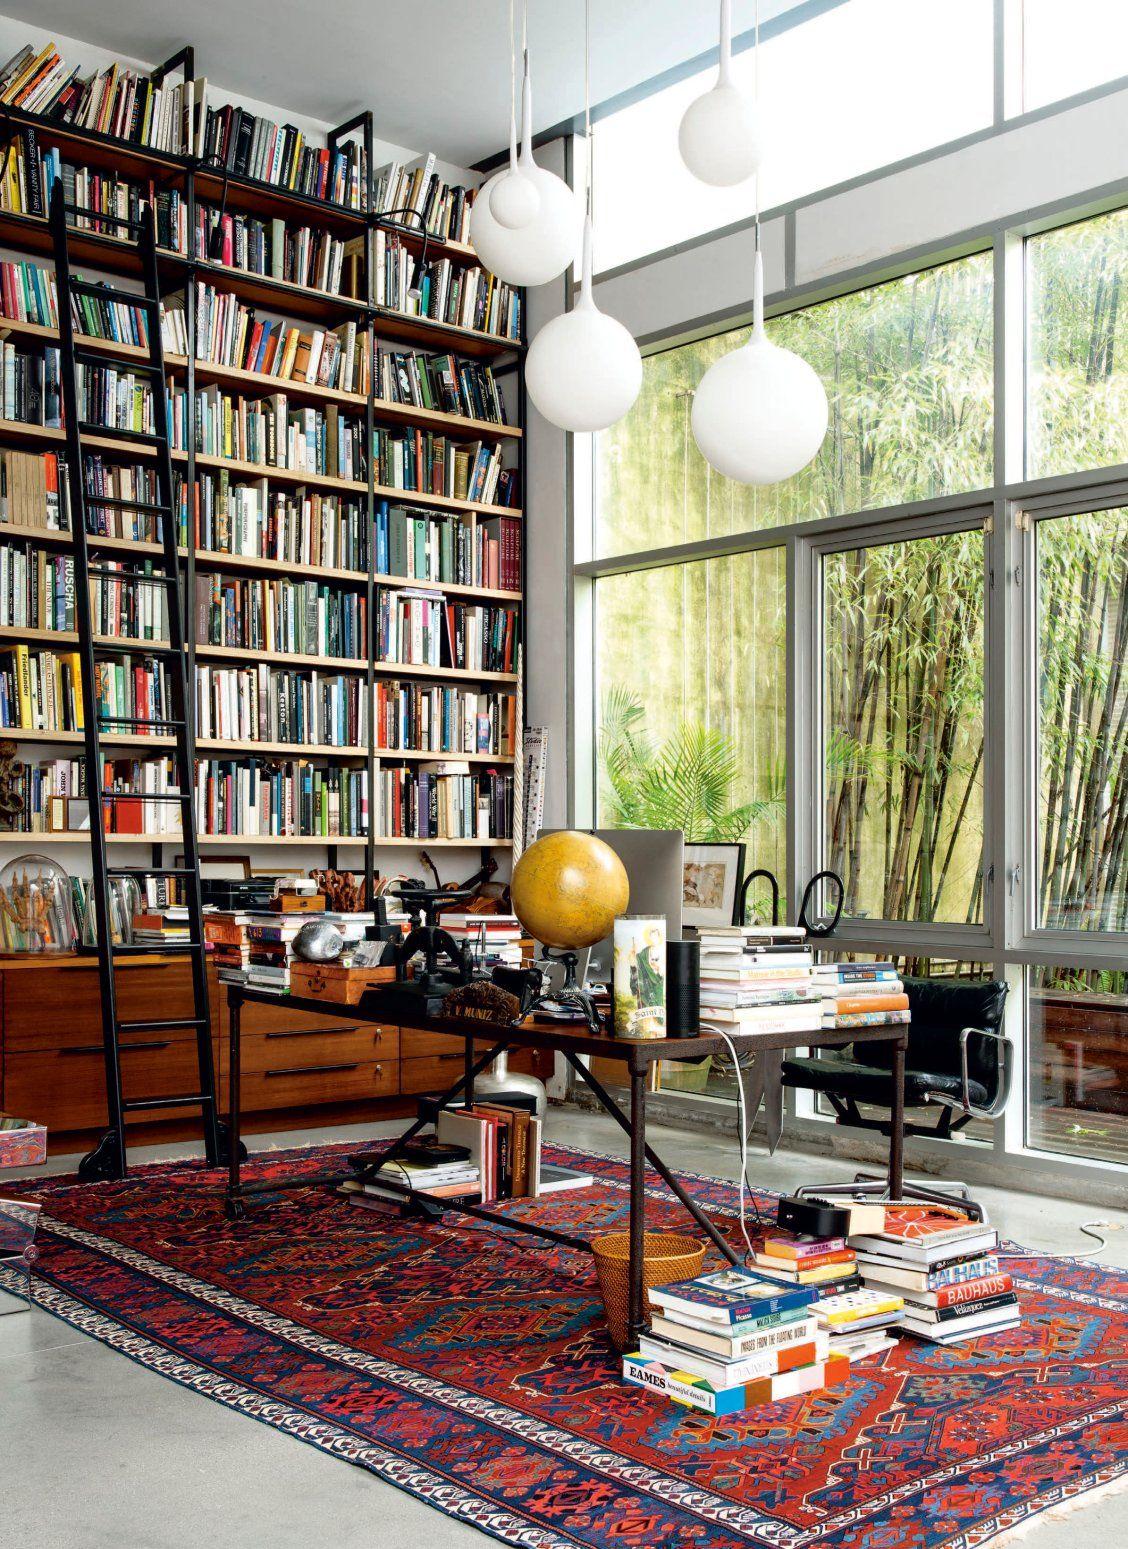 Bibliostyle By Nina Freudenberger Sadie Stein 9780525575443 Penguinrandomhouse Com Books In 2020 Home Library Design Home Home Interior Design